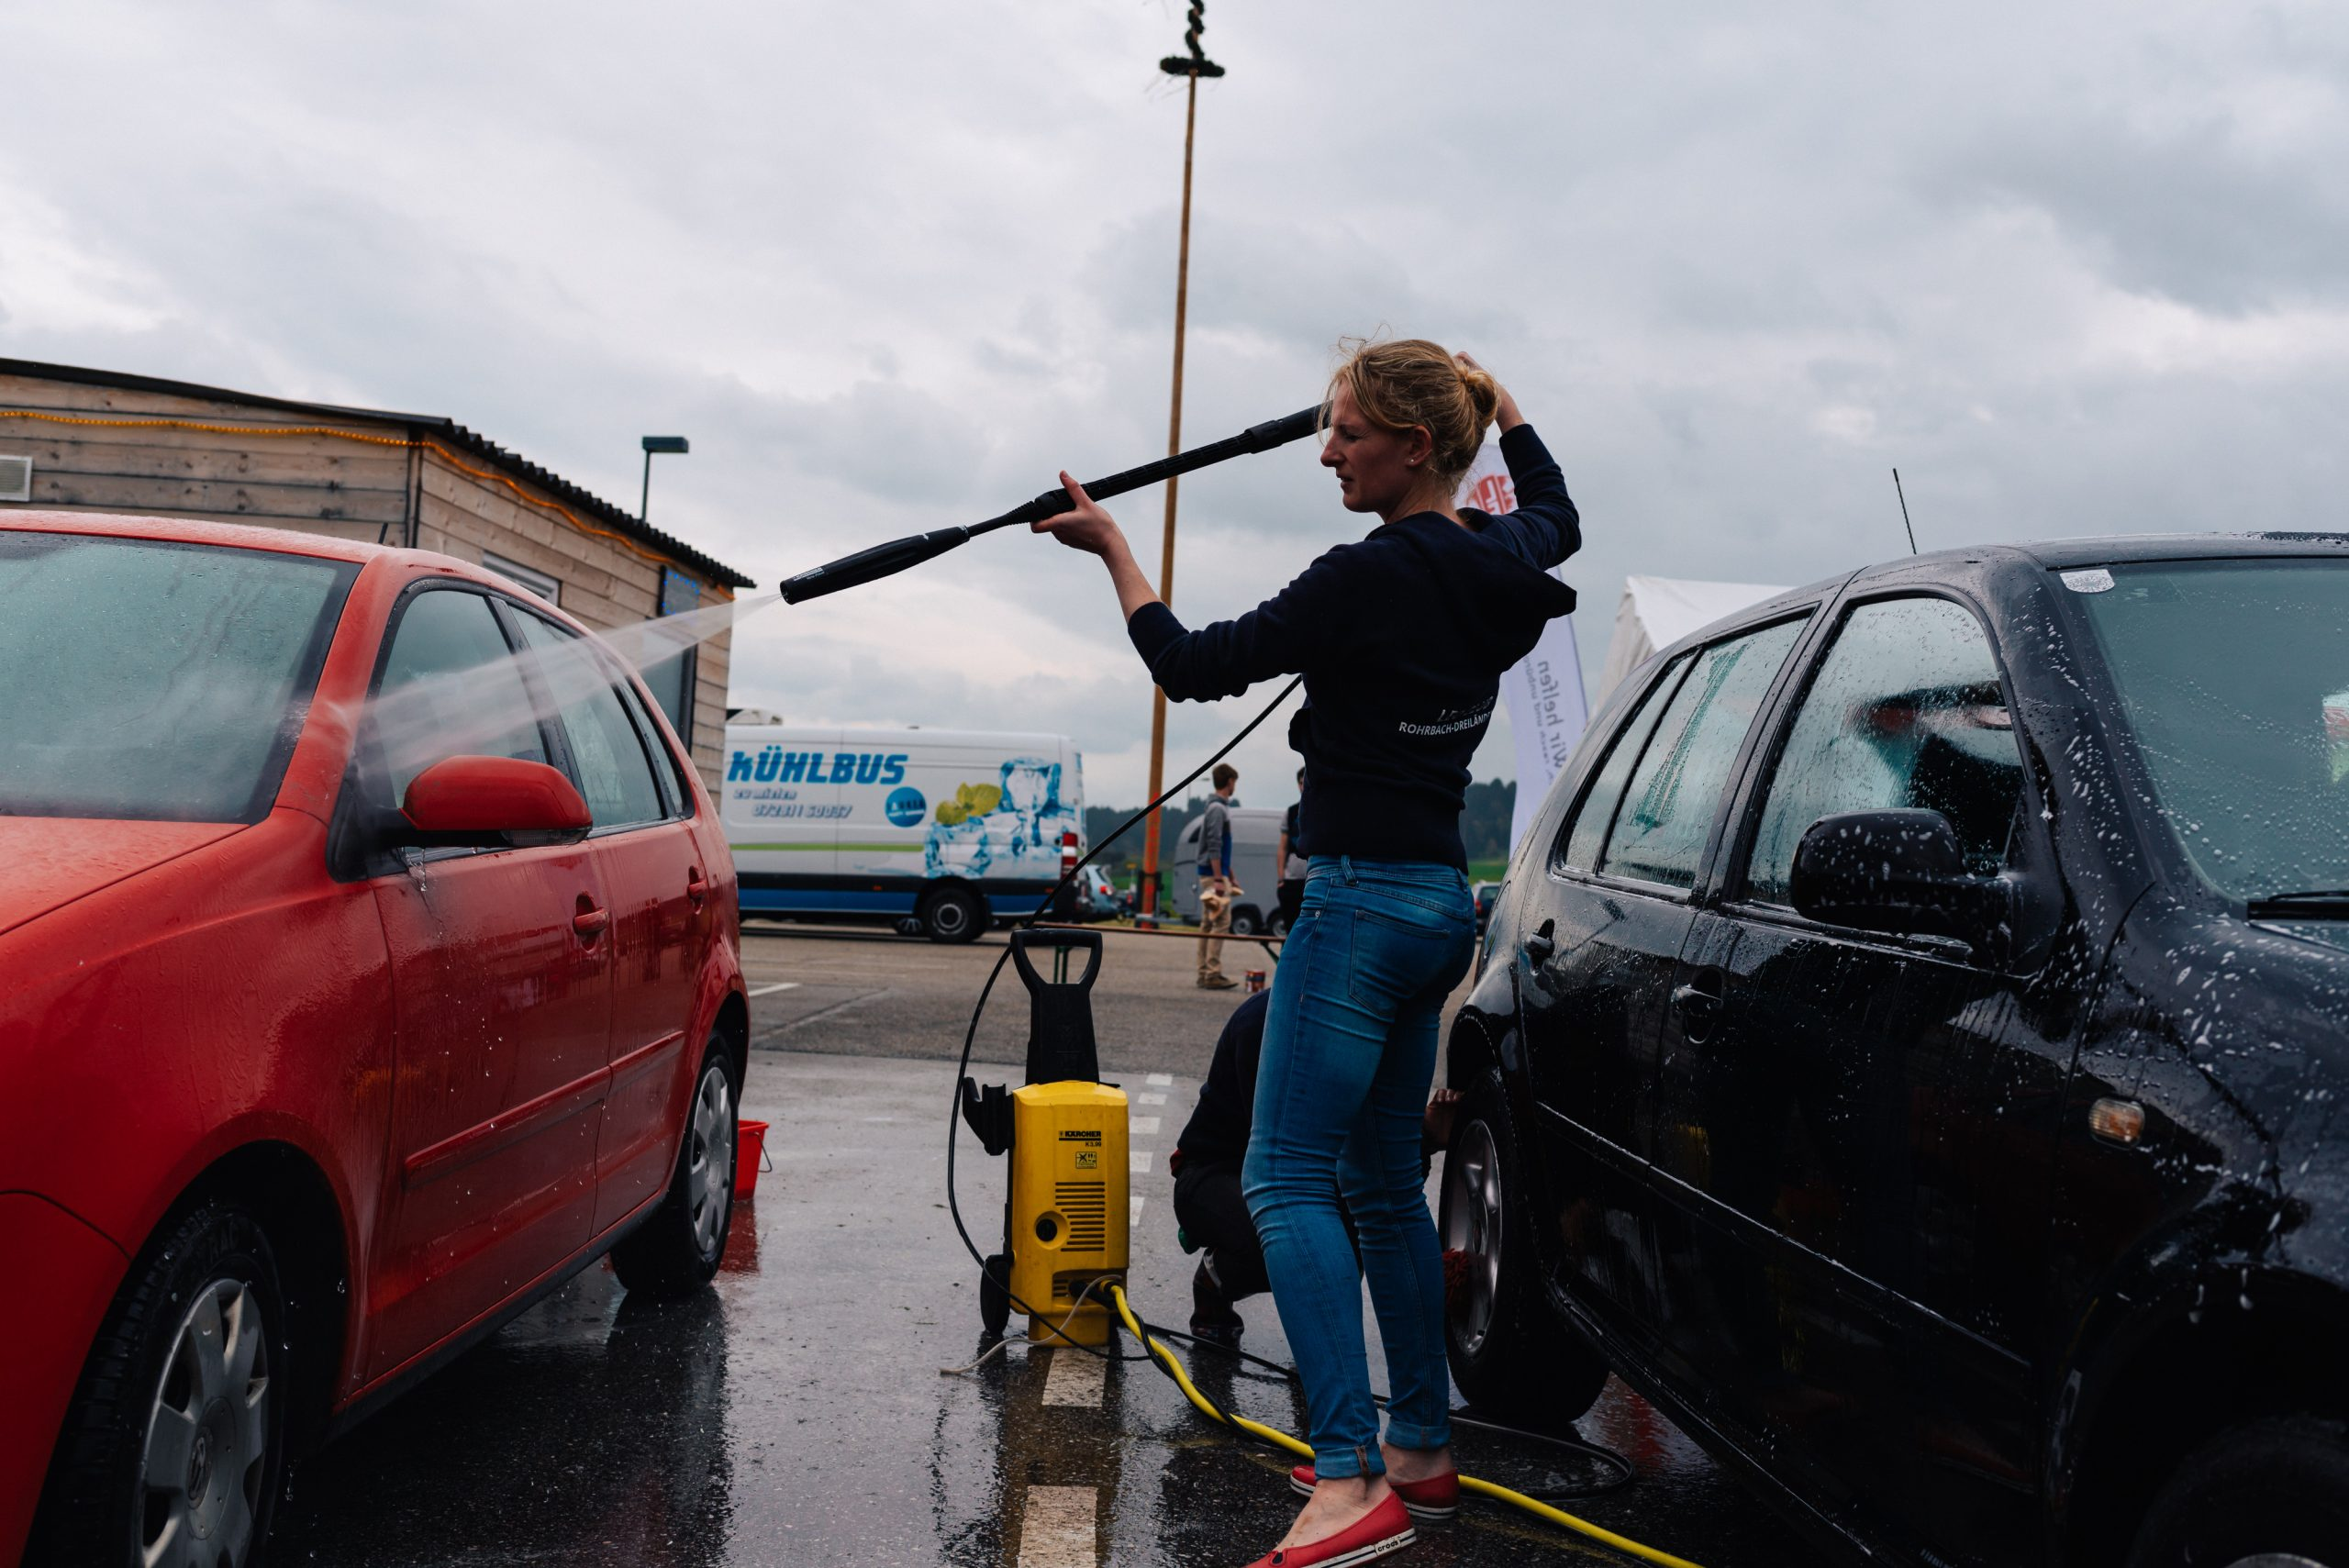 Charity Car Wash Activity